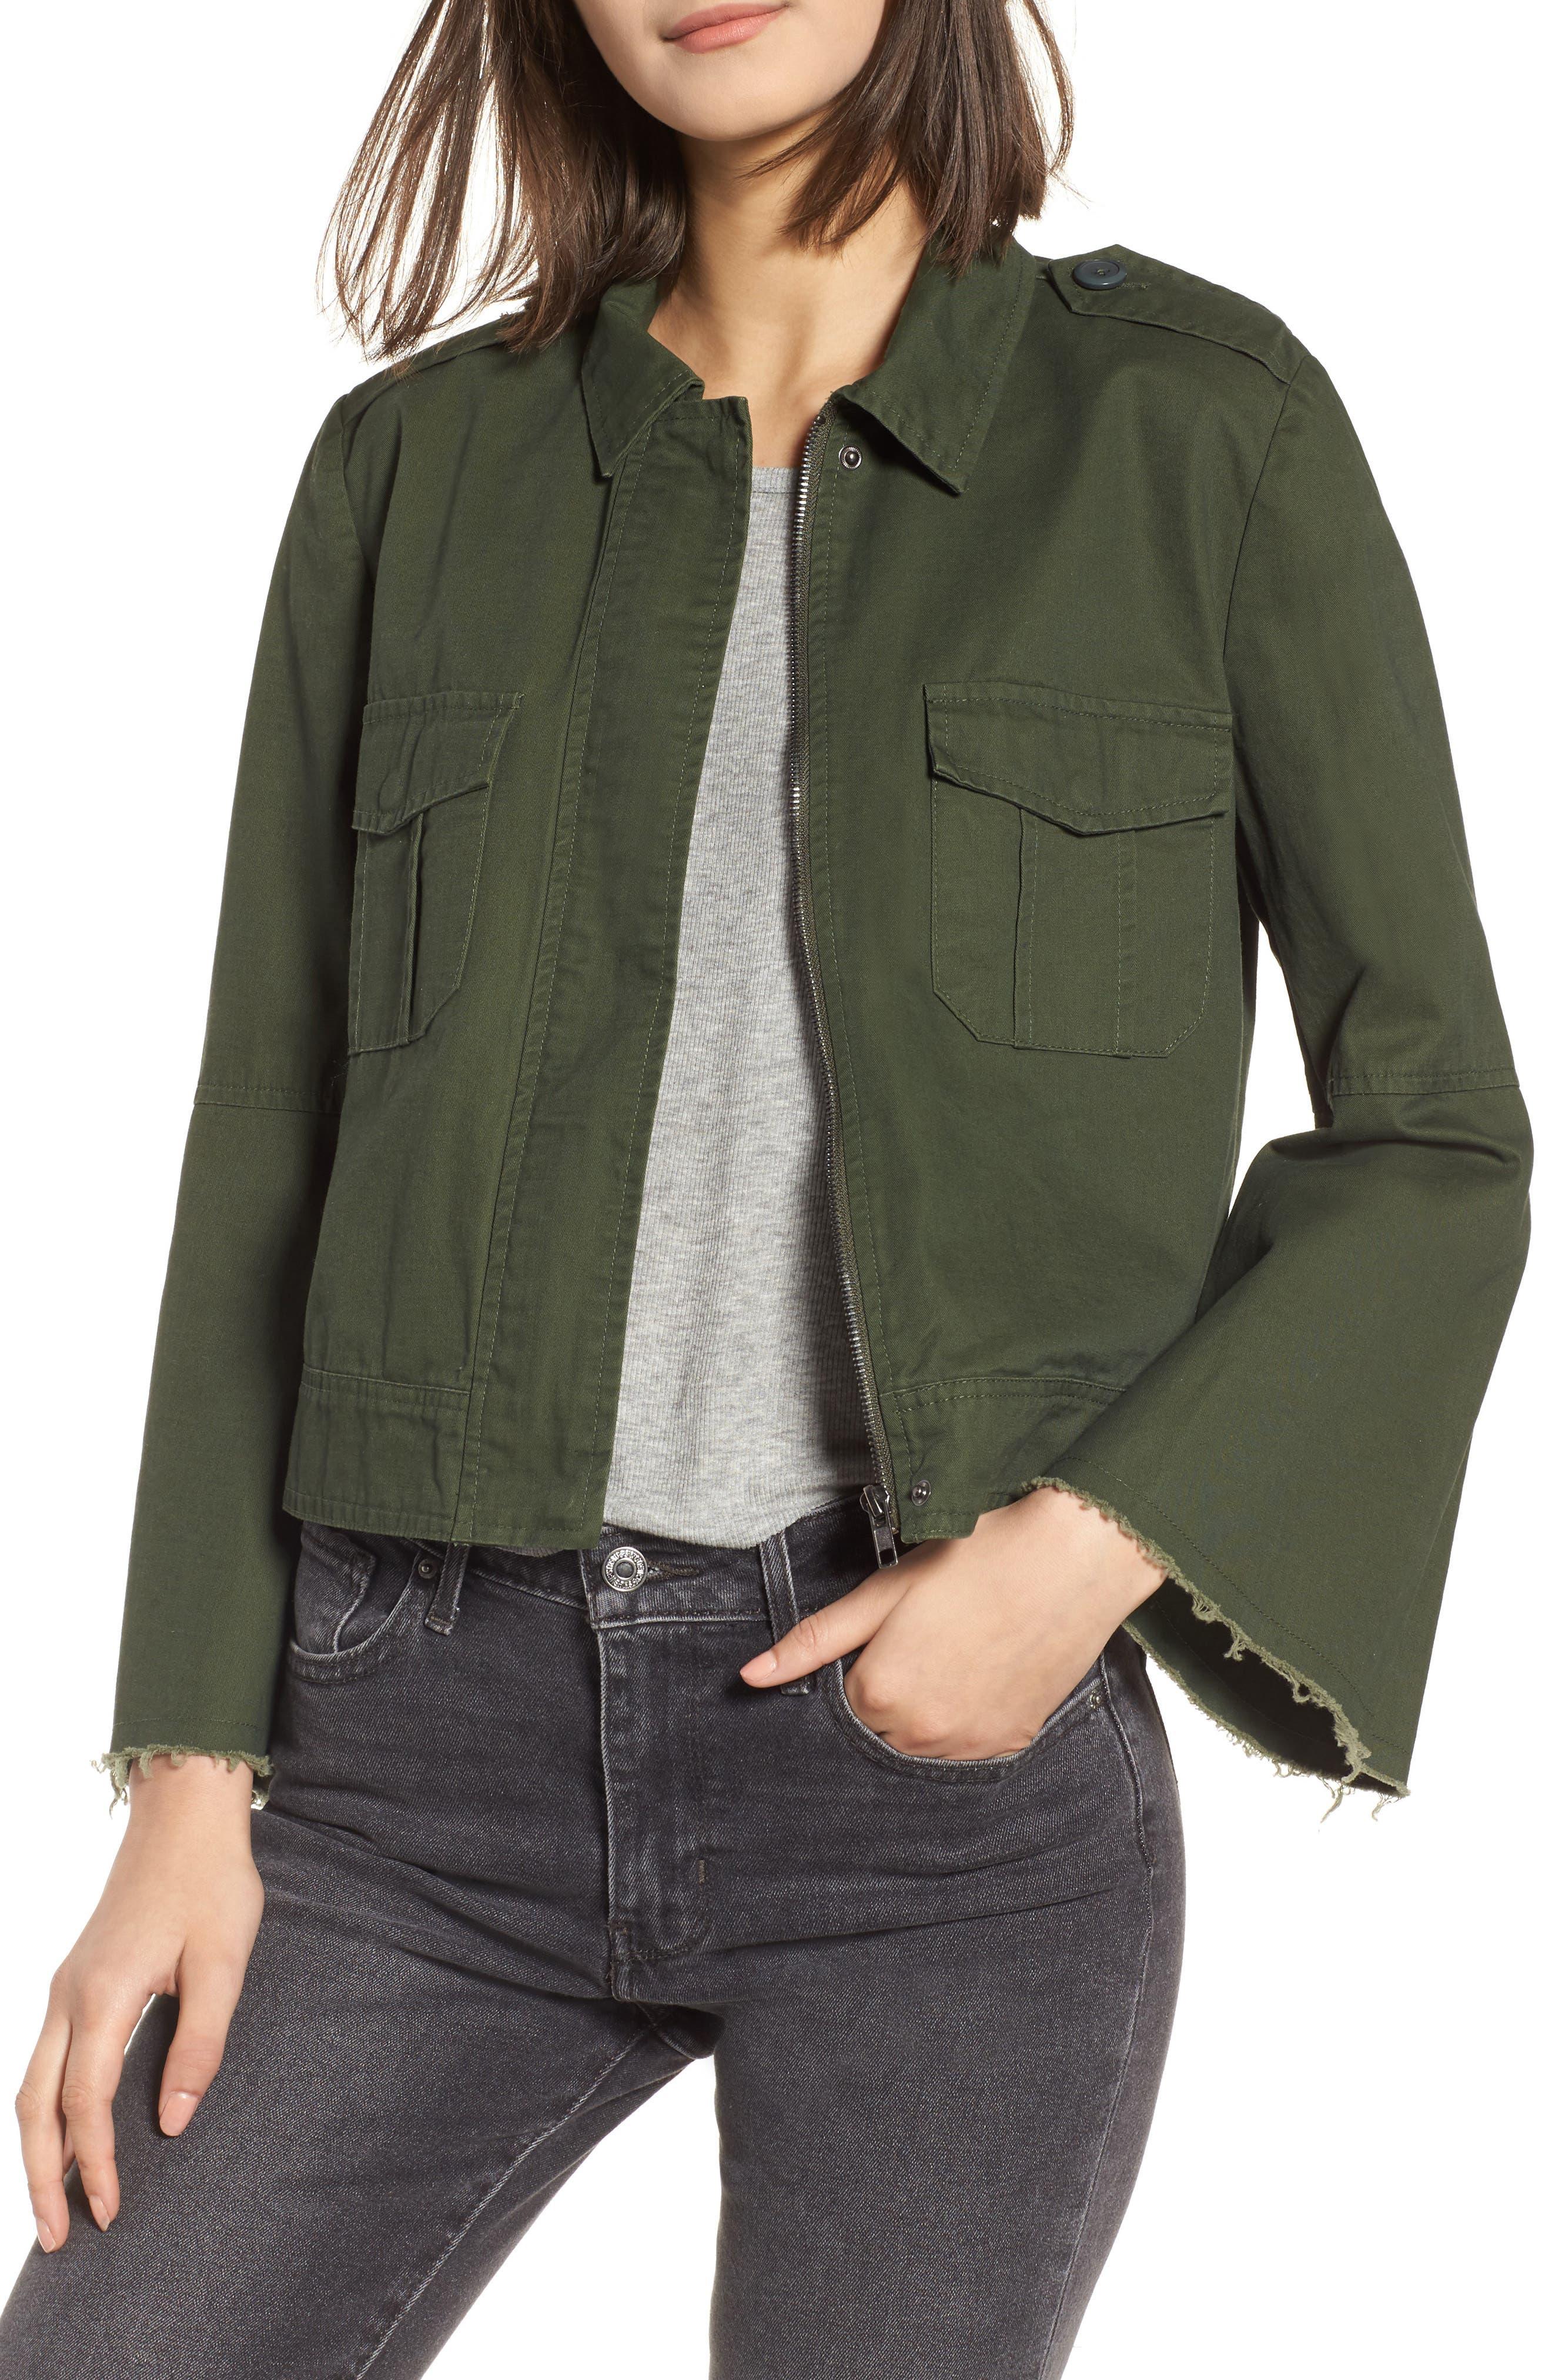 Jennie Cotton Twill Army Jacket,                             Main thumbnail 1, color,                             301